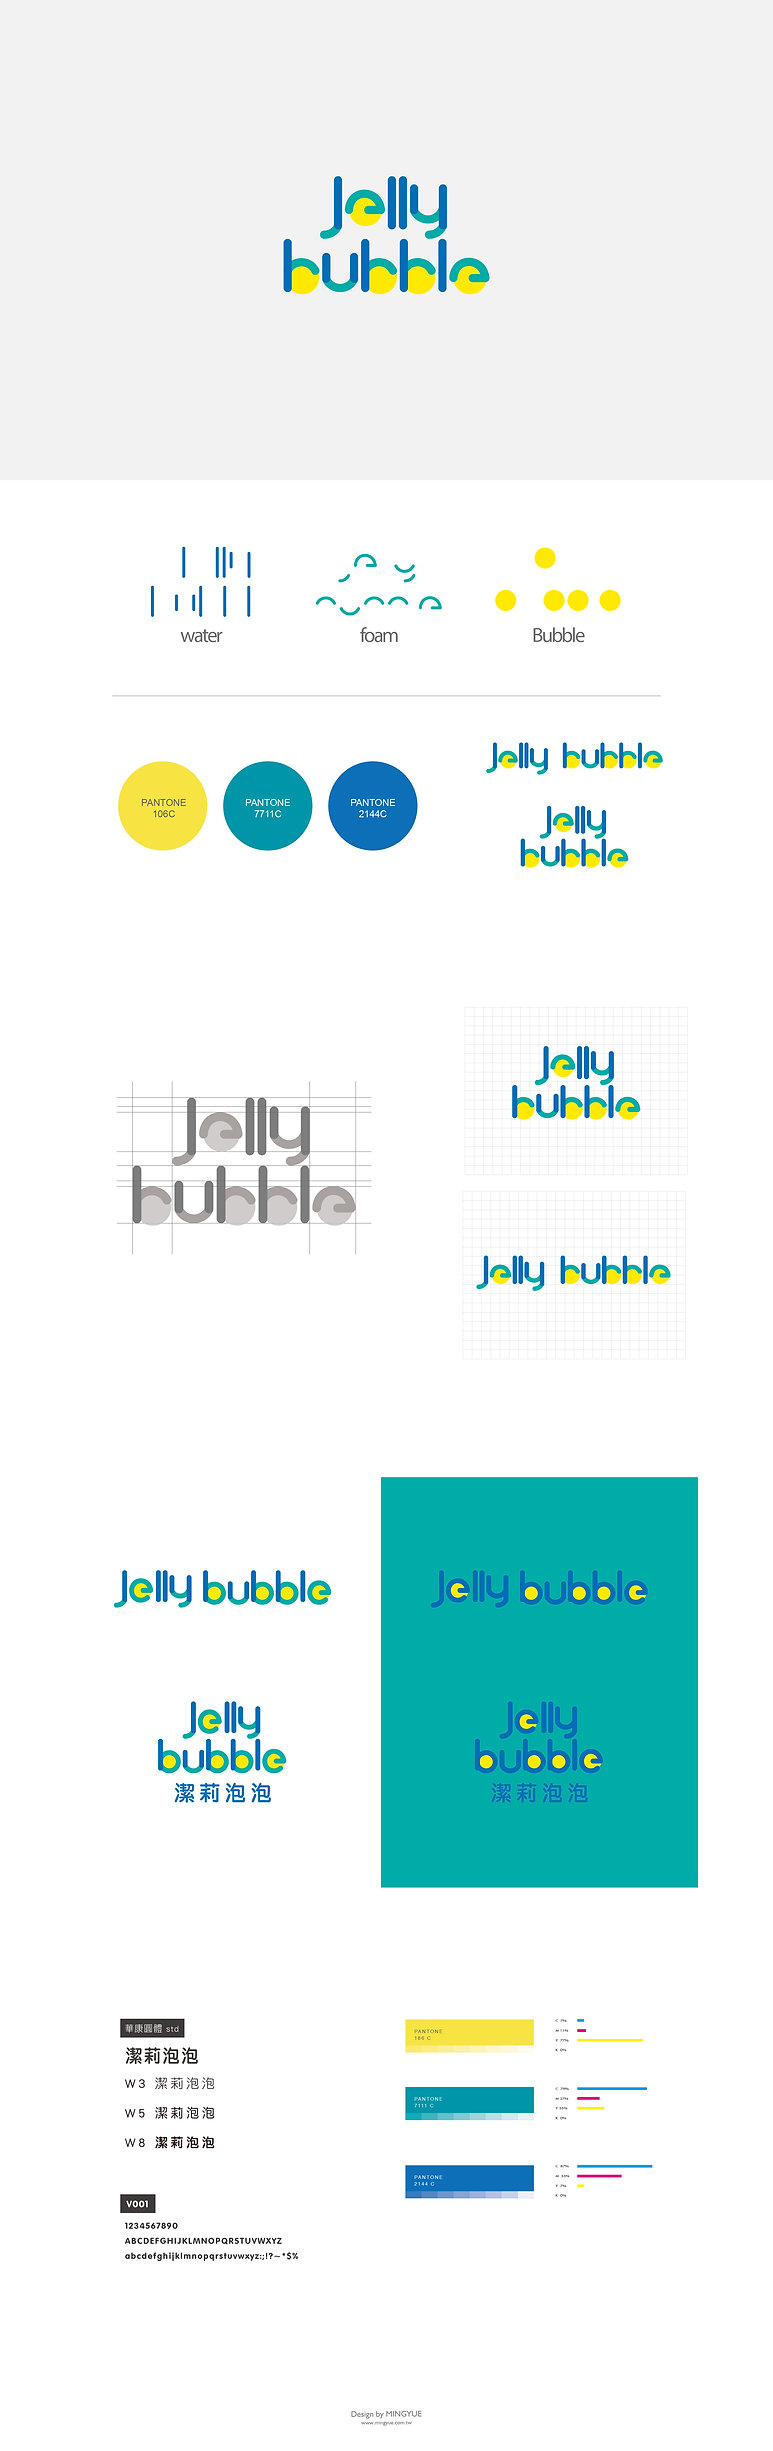 jelly bubble品牌設計.jpg